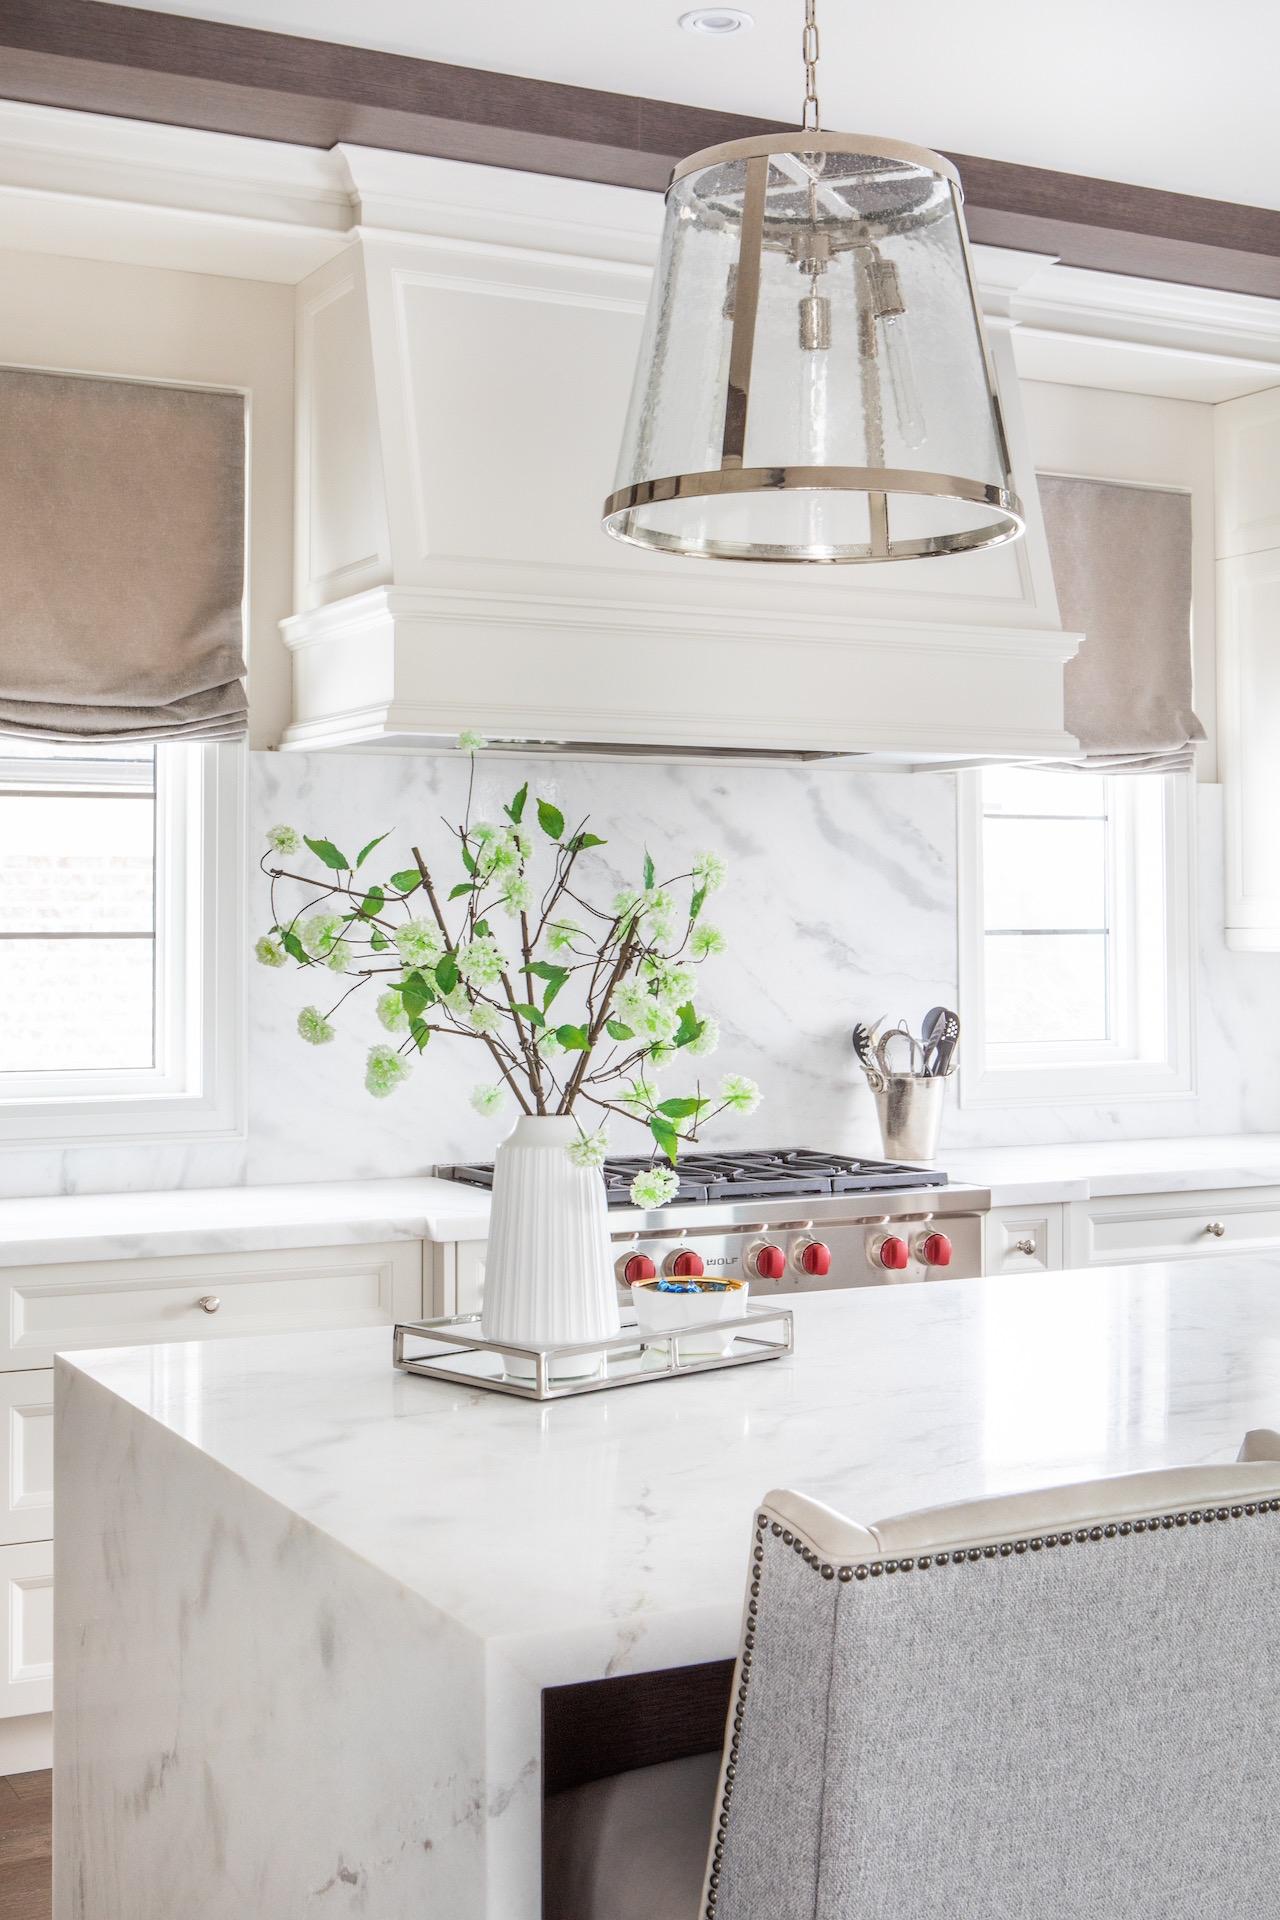 White kitchen island with plant